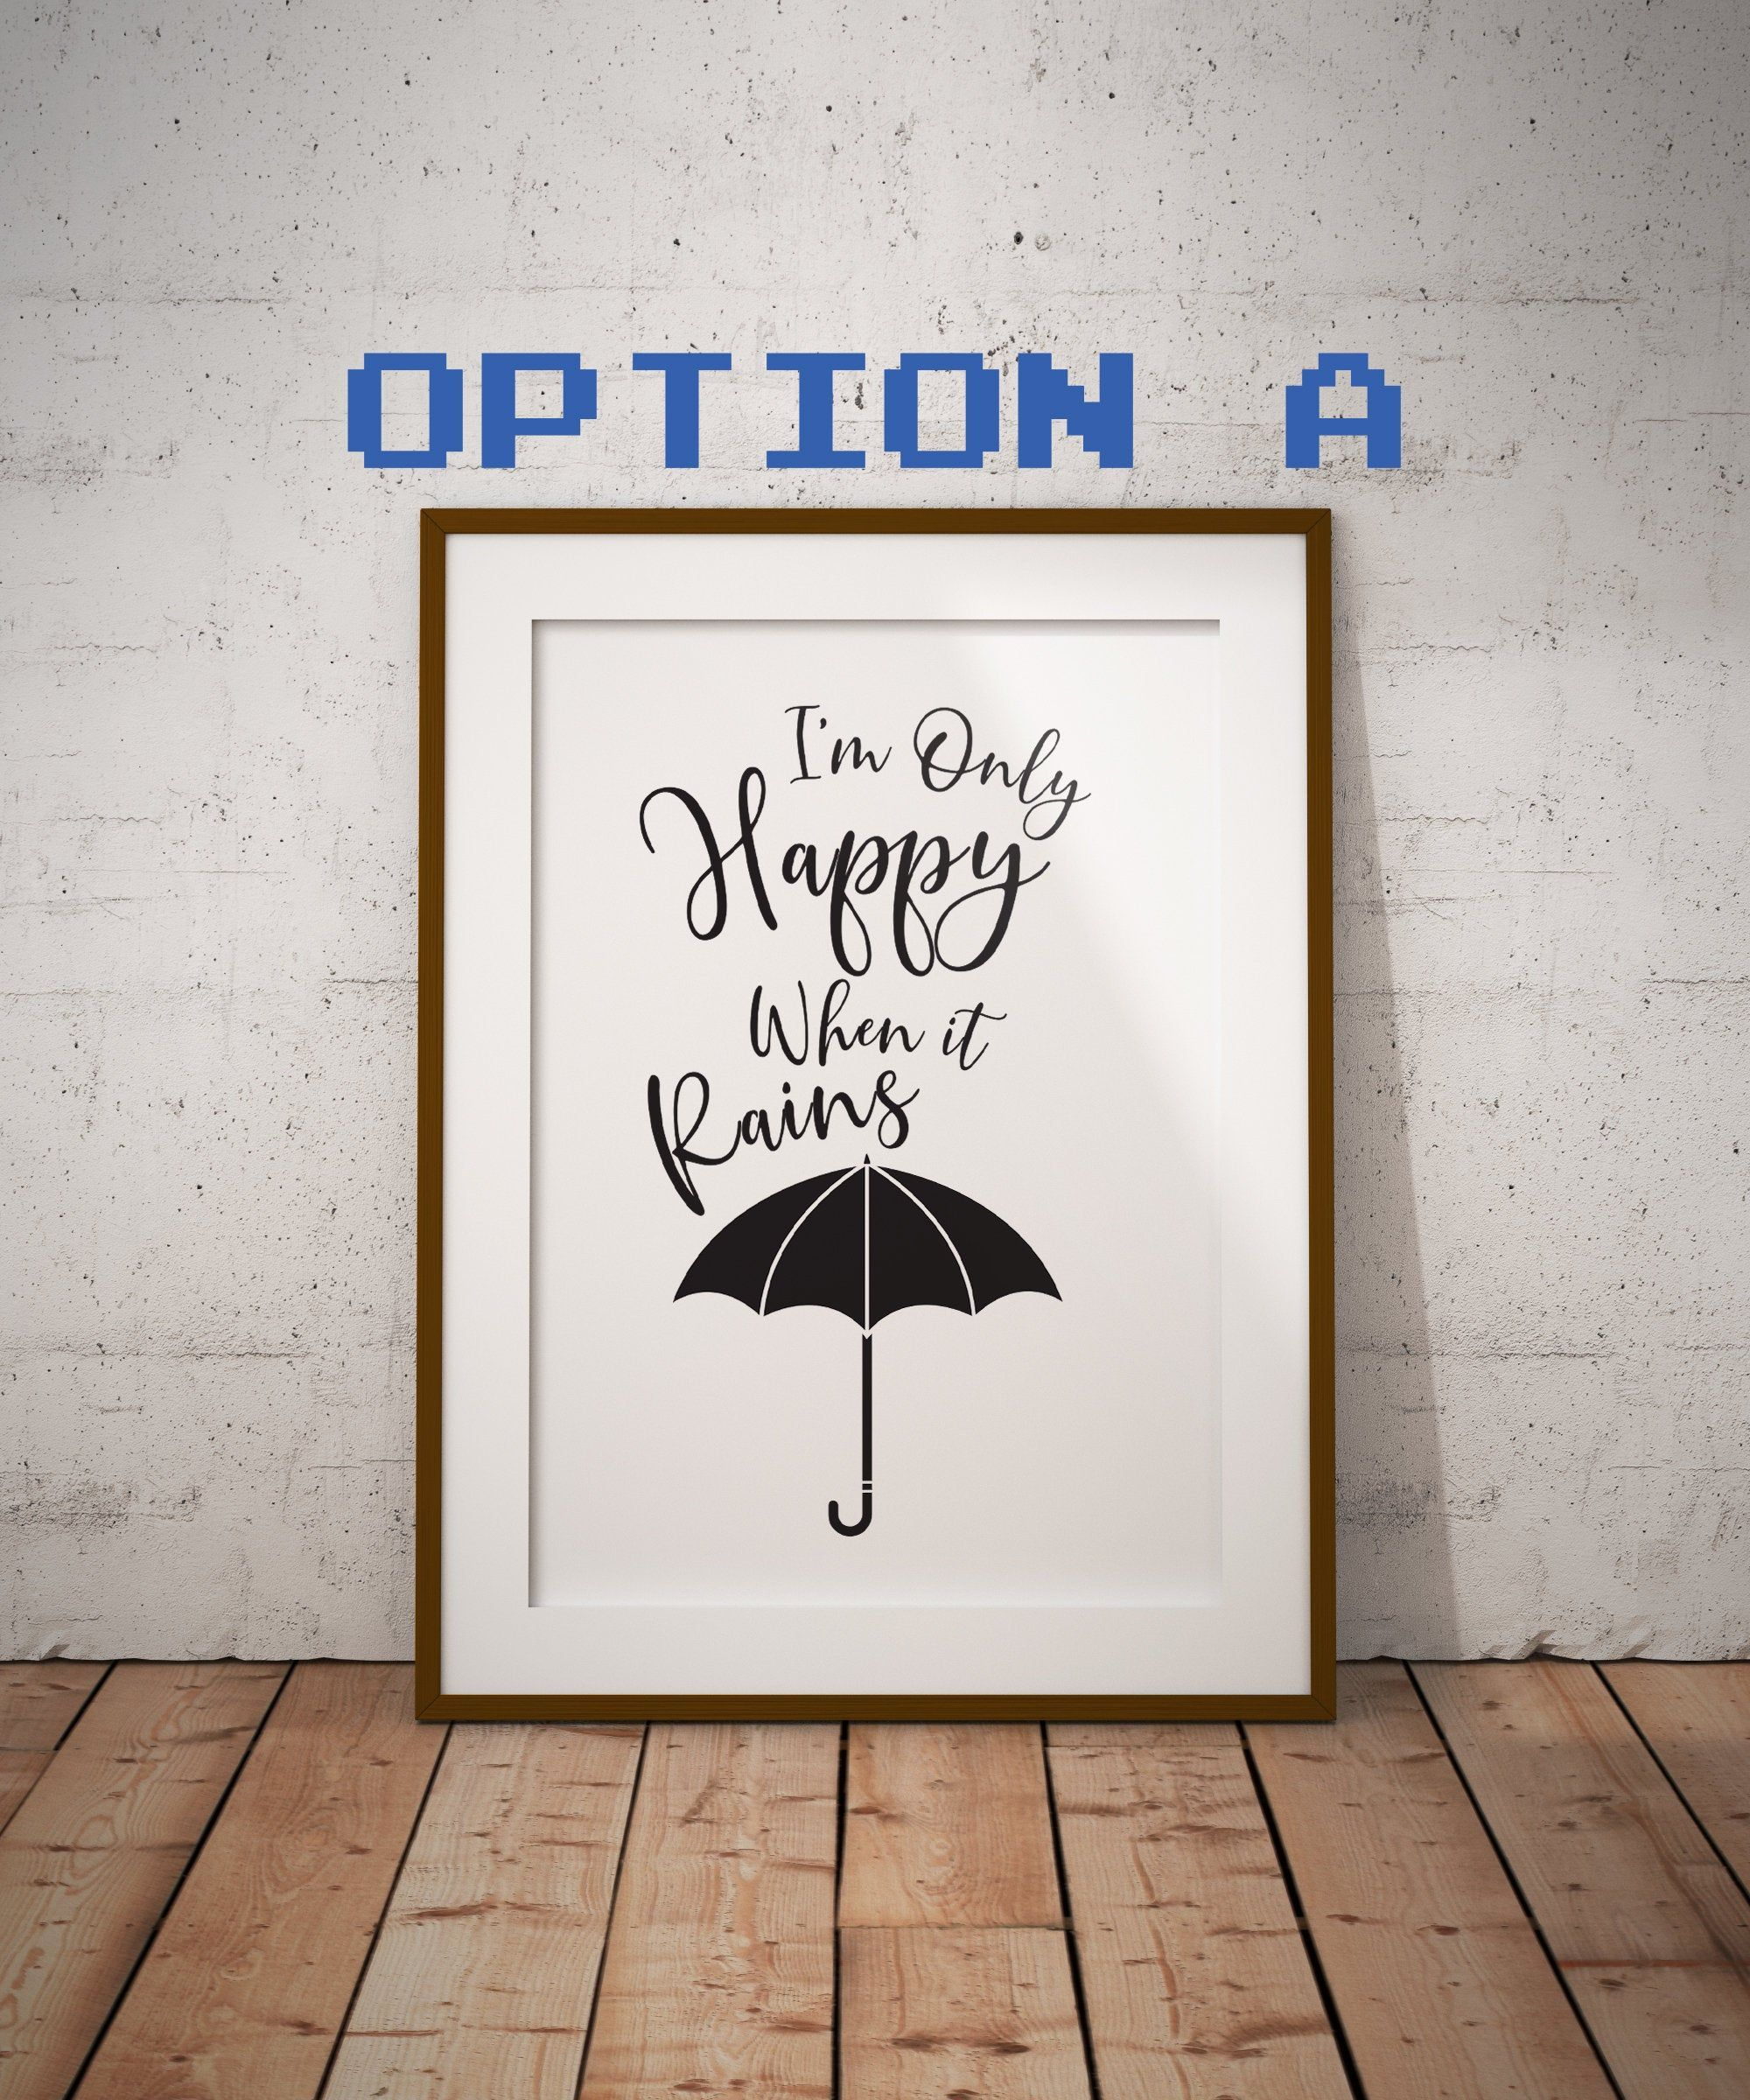 Only Happy When It Rains  Garbage  Poster  Lyrics  Music  Print  Song  90s Music  Gru Only Happy When It Rains  Garbage  Poster  Lyrics  Music  Print  Song  90s Music  Gr...